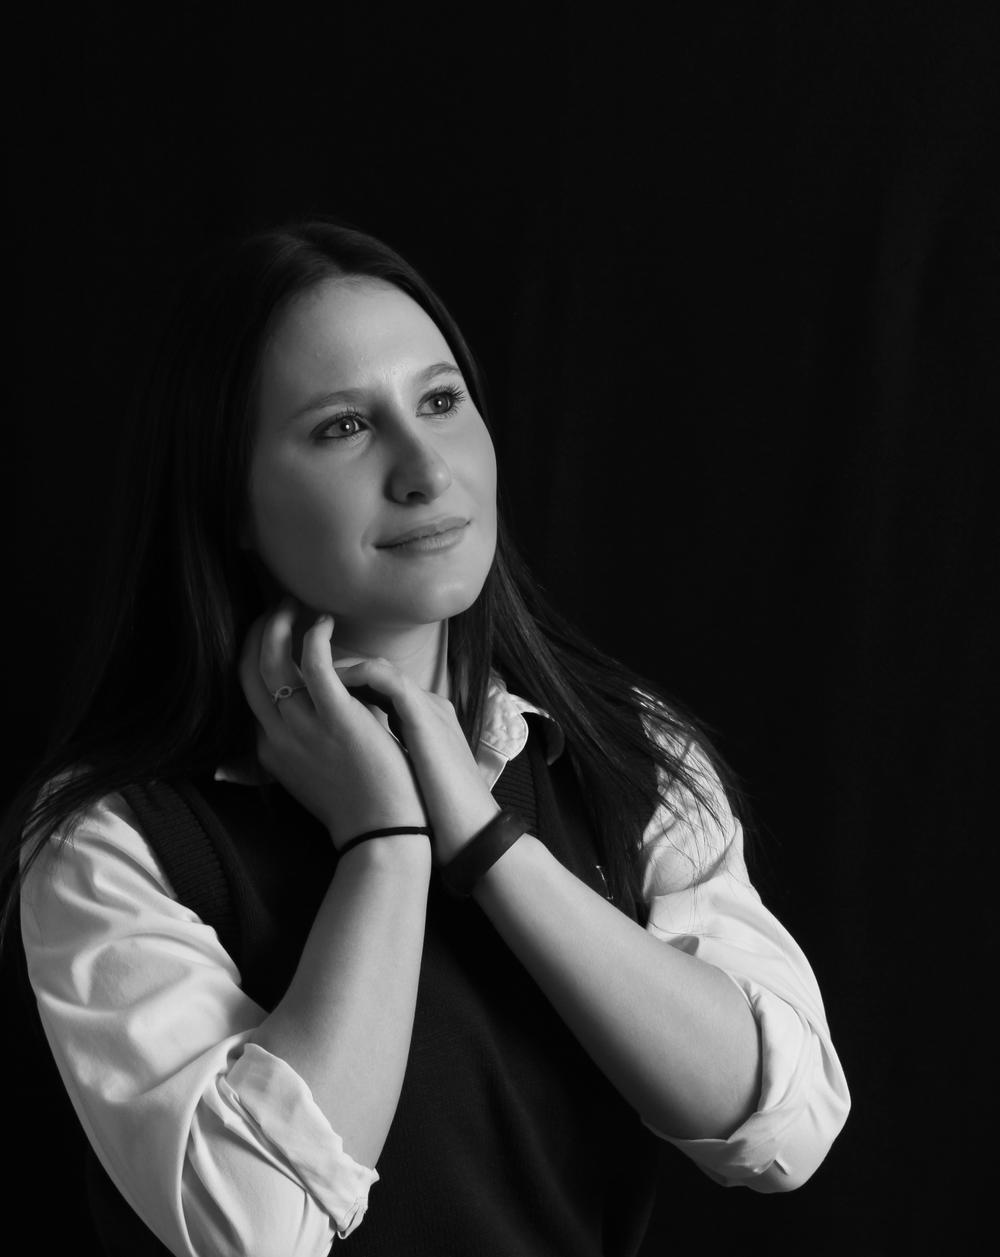 BGHS Student Lauren Page